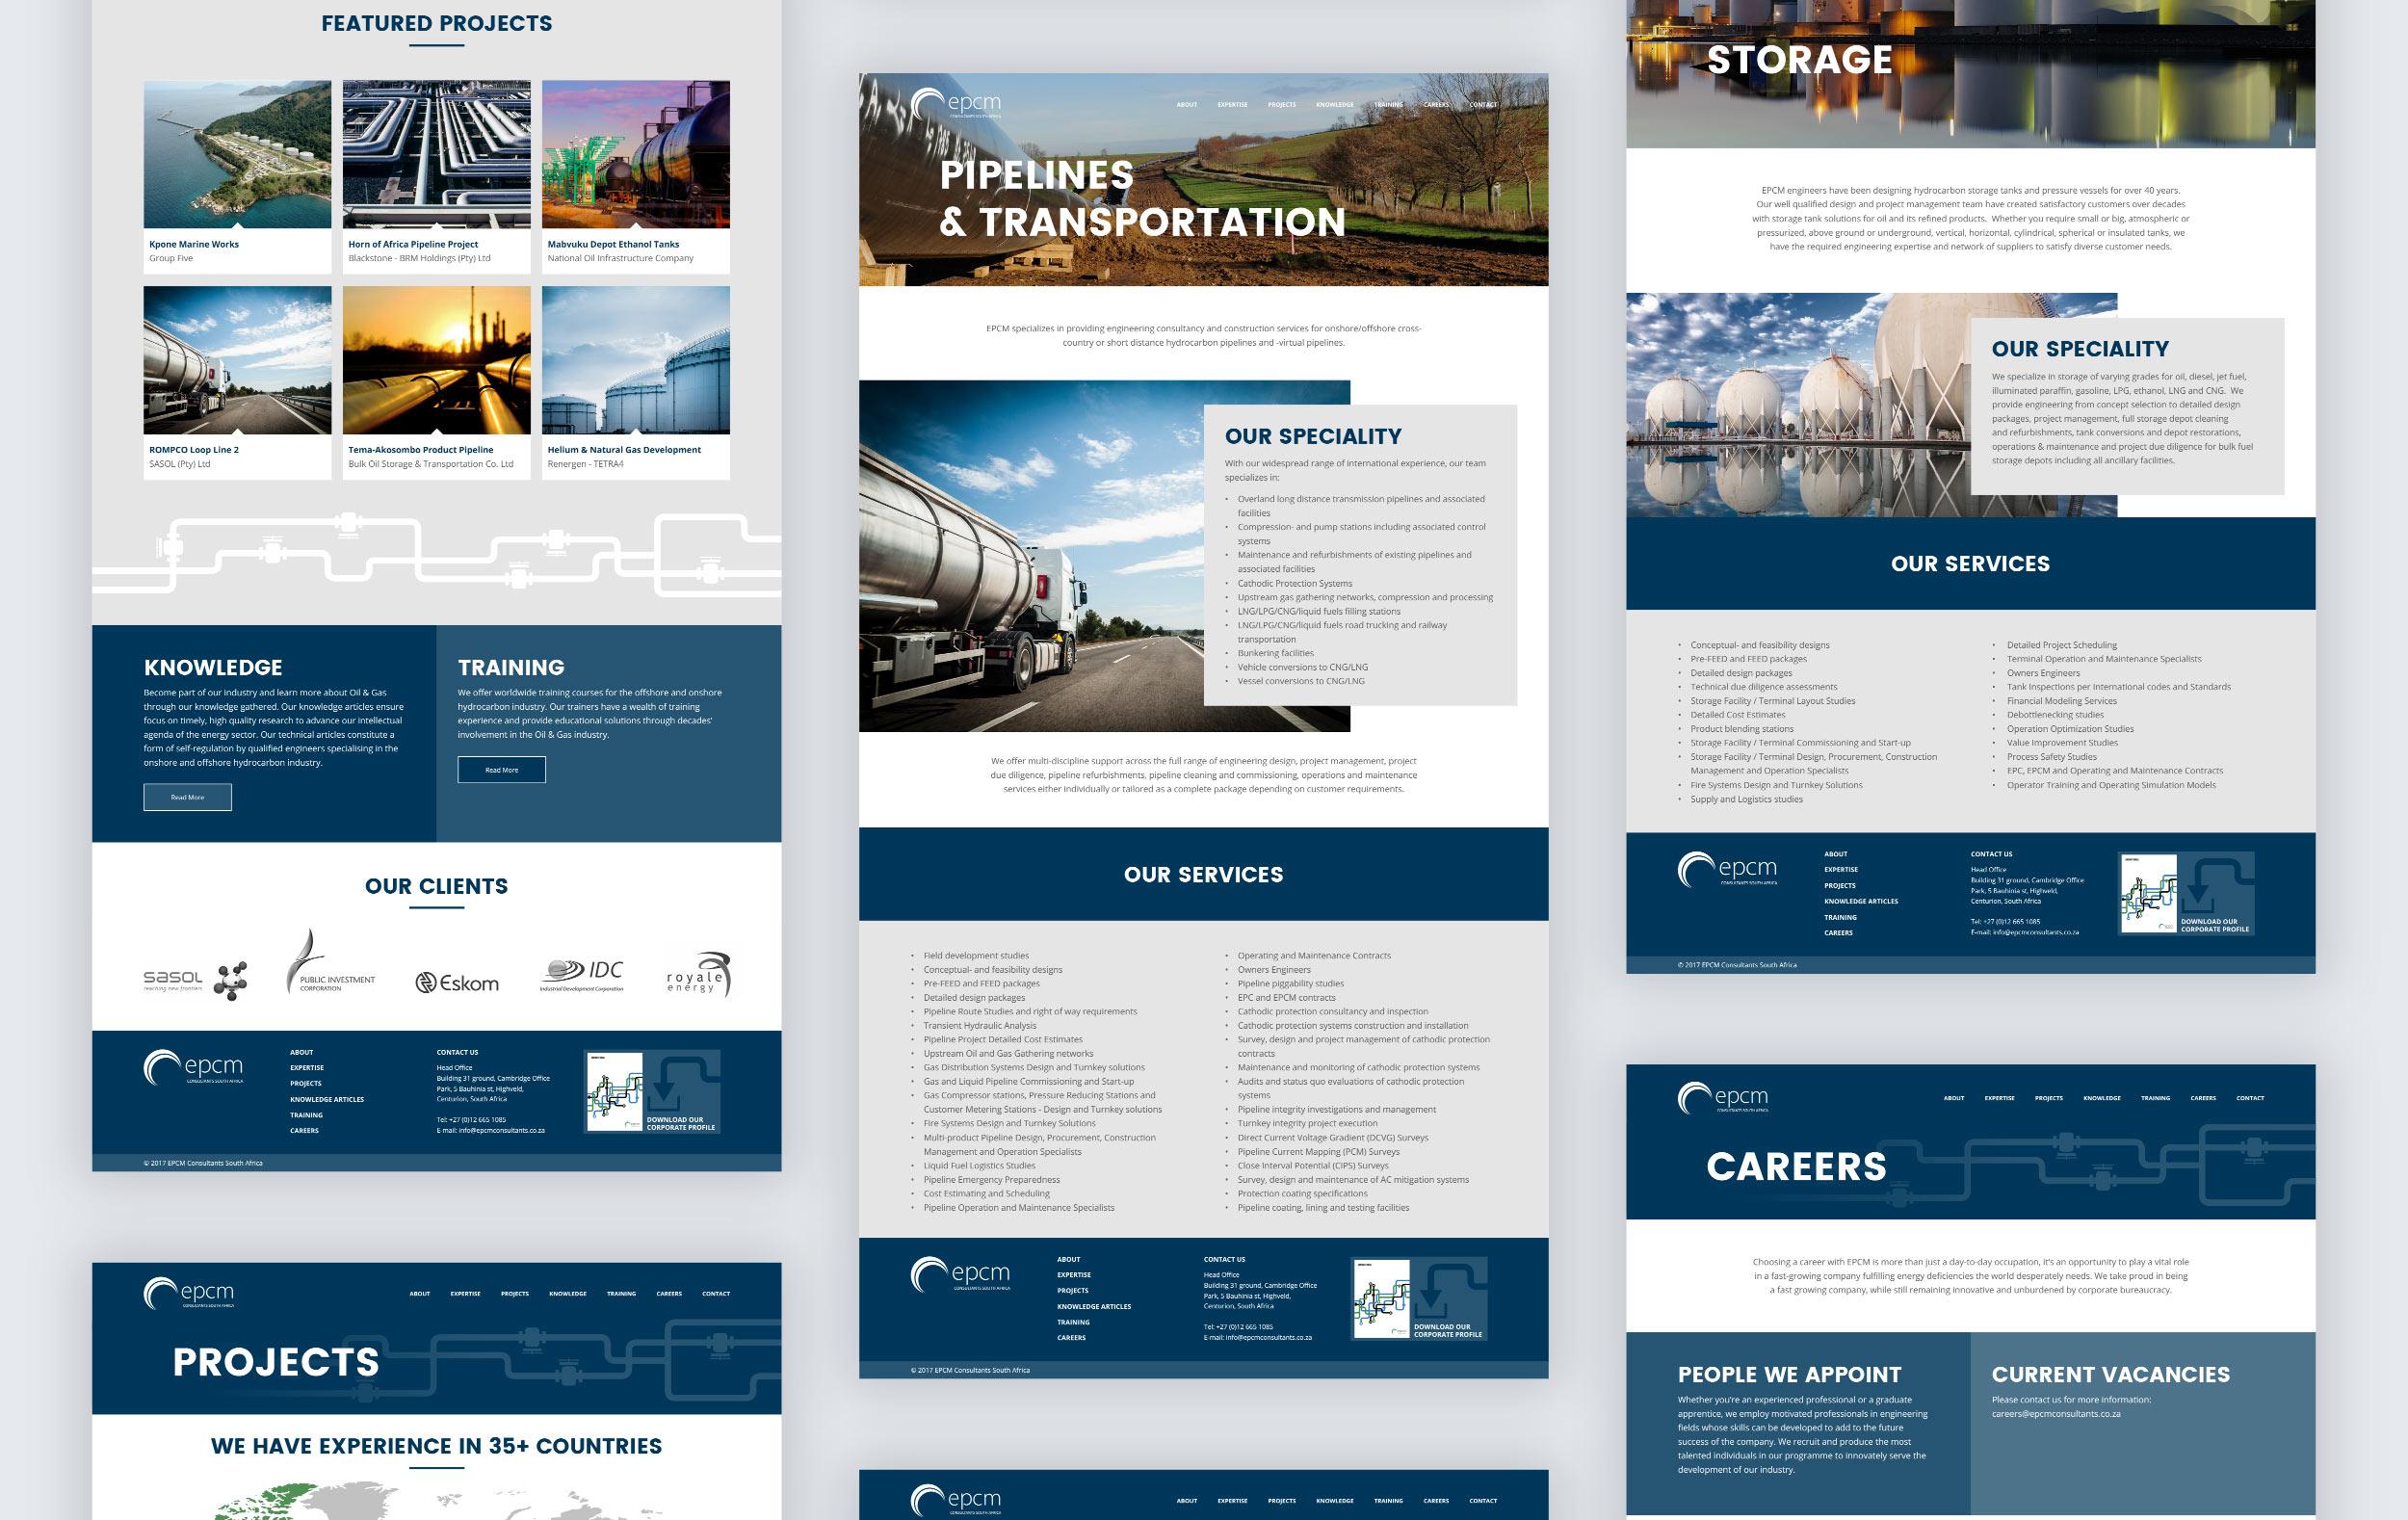 EPCM website redesign